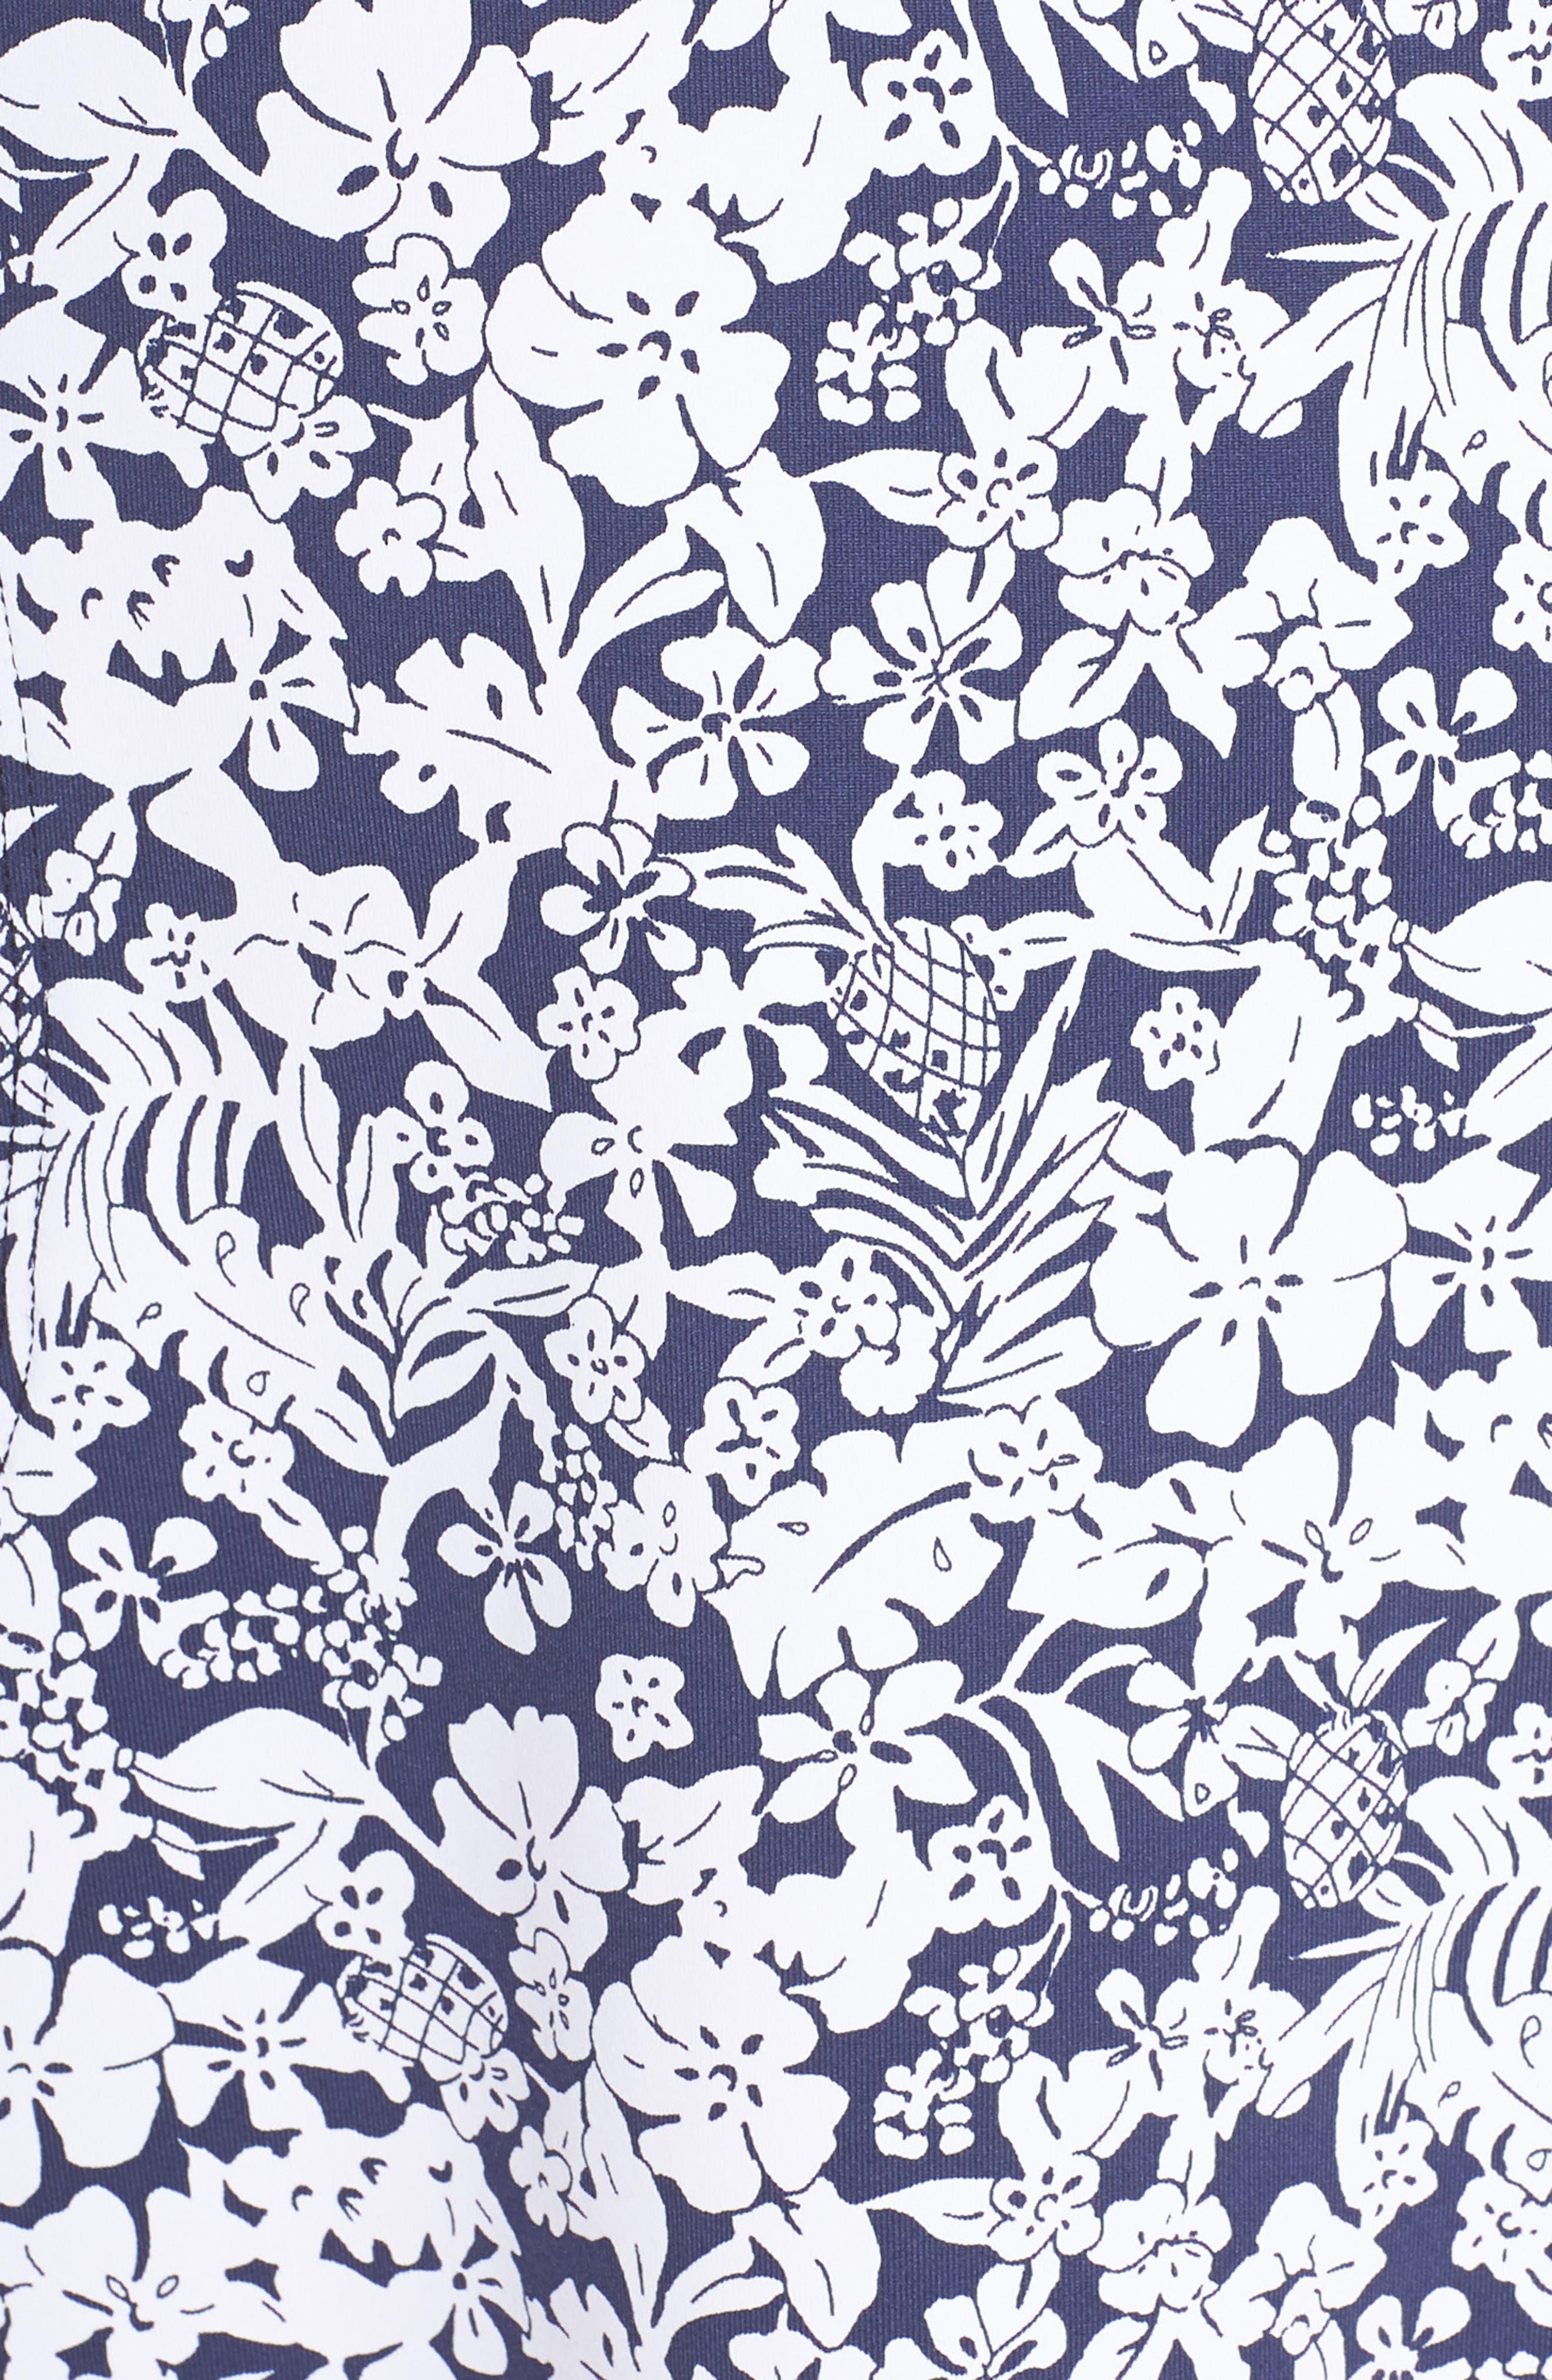 Riviera Tiles Cover-Up Dress,                             Alternate thumbnail 5, color,                             400